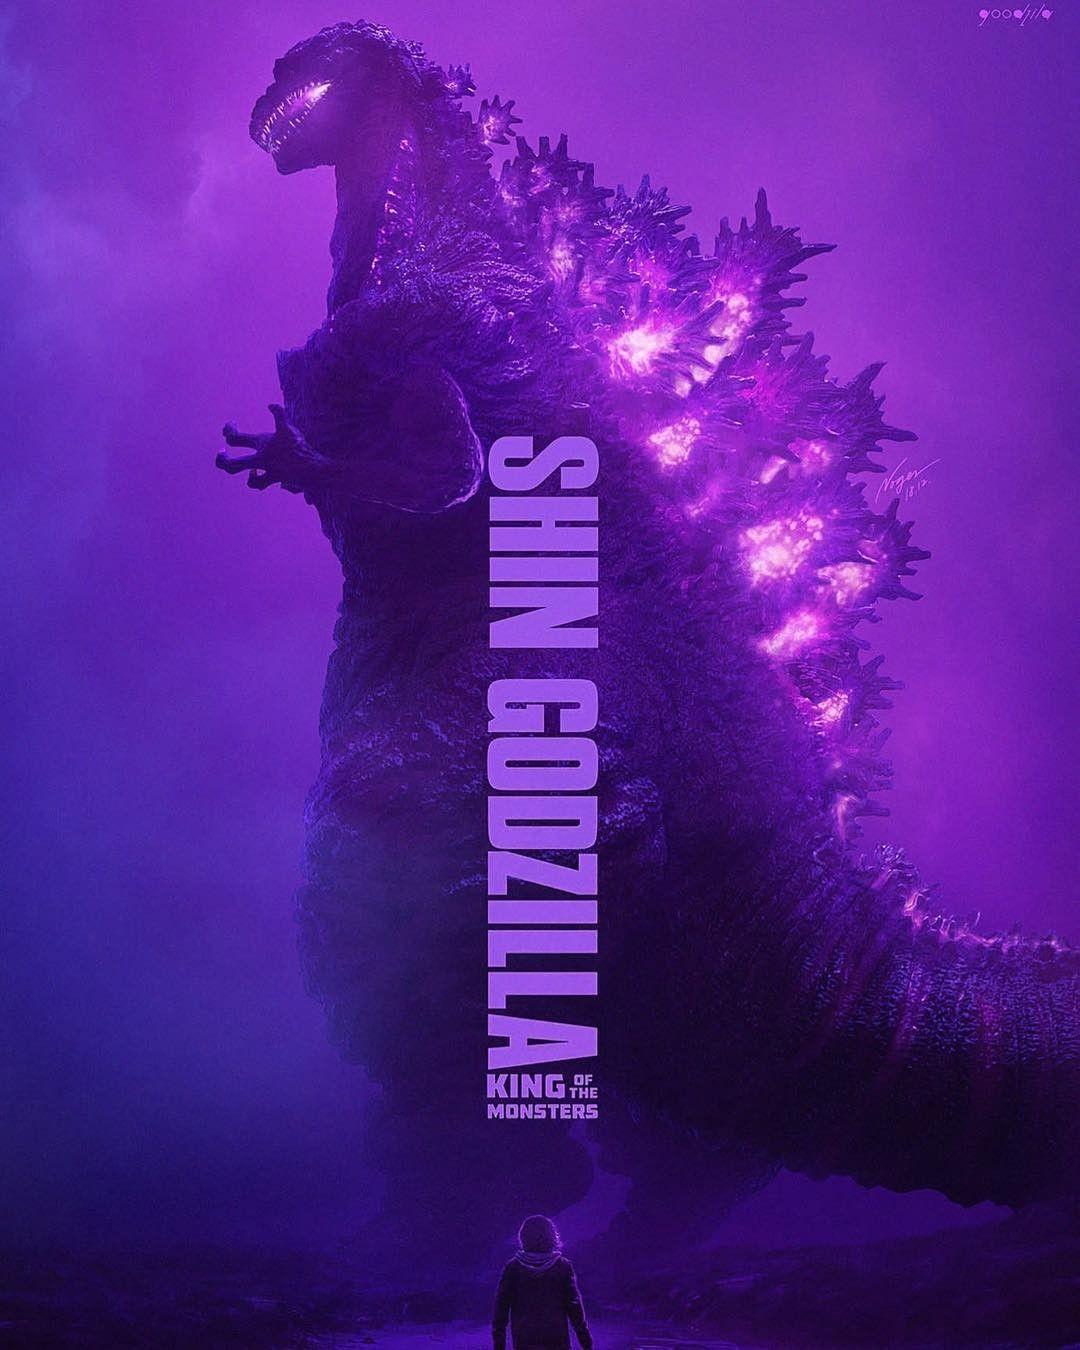 Godzilla 2 Imax Poster Textless: 005 Godzilla 2014 Monster Fighting Hot Movie 24x36 Poster